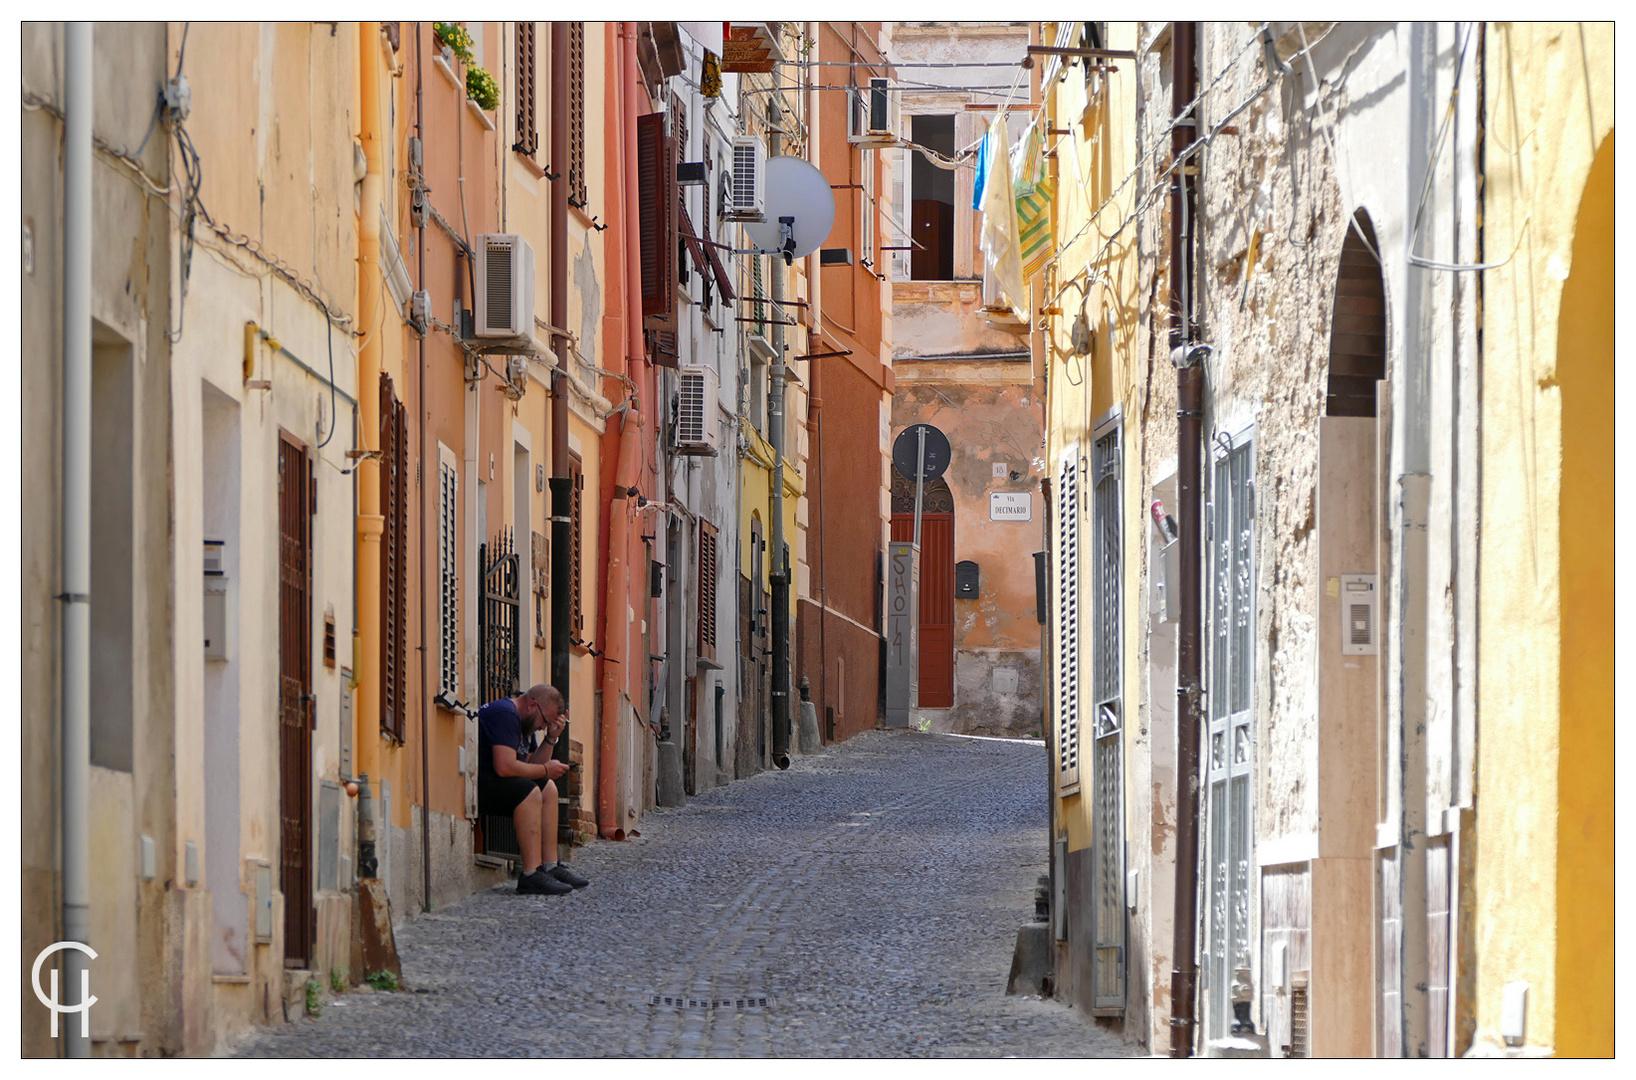 Italienische Gassen - Alghero